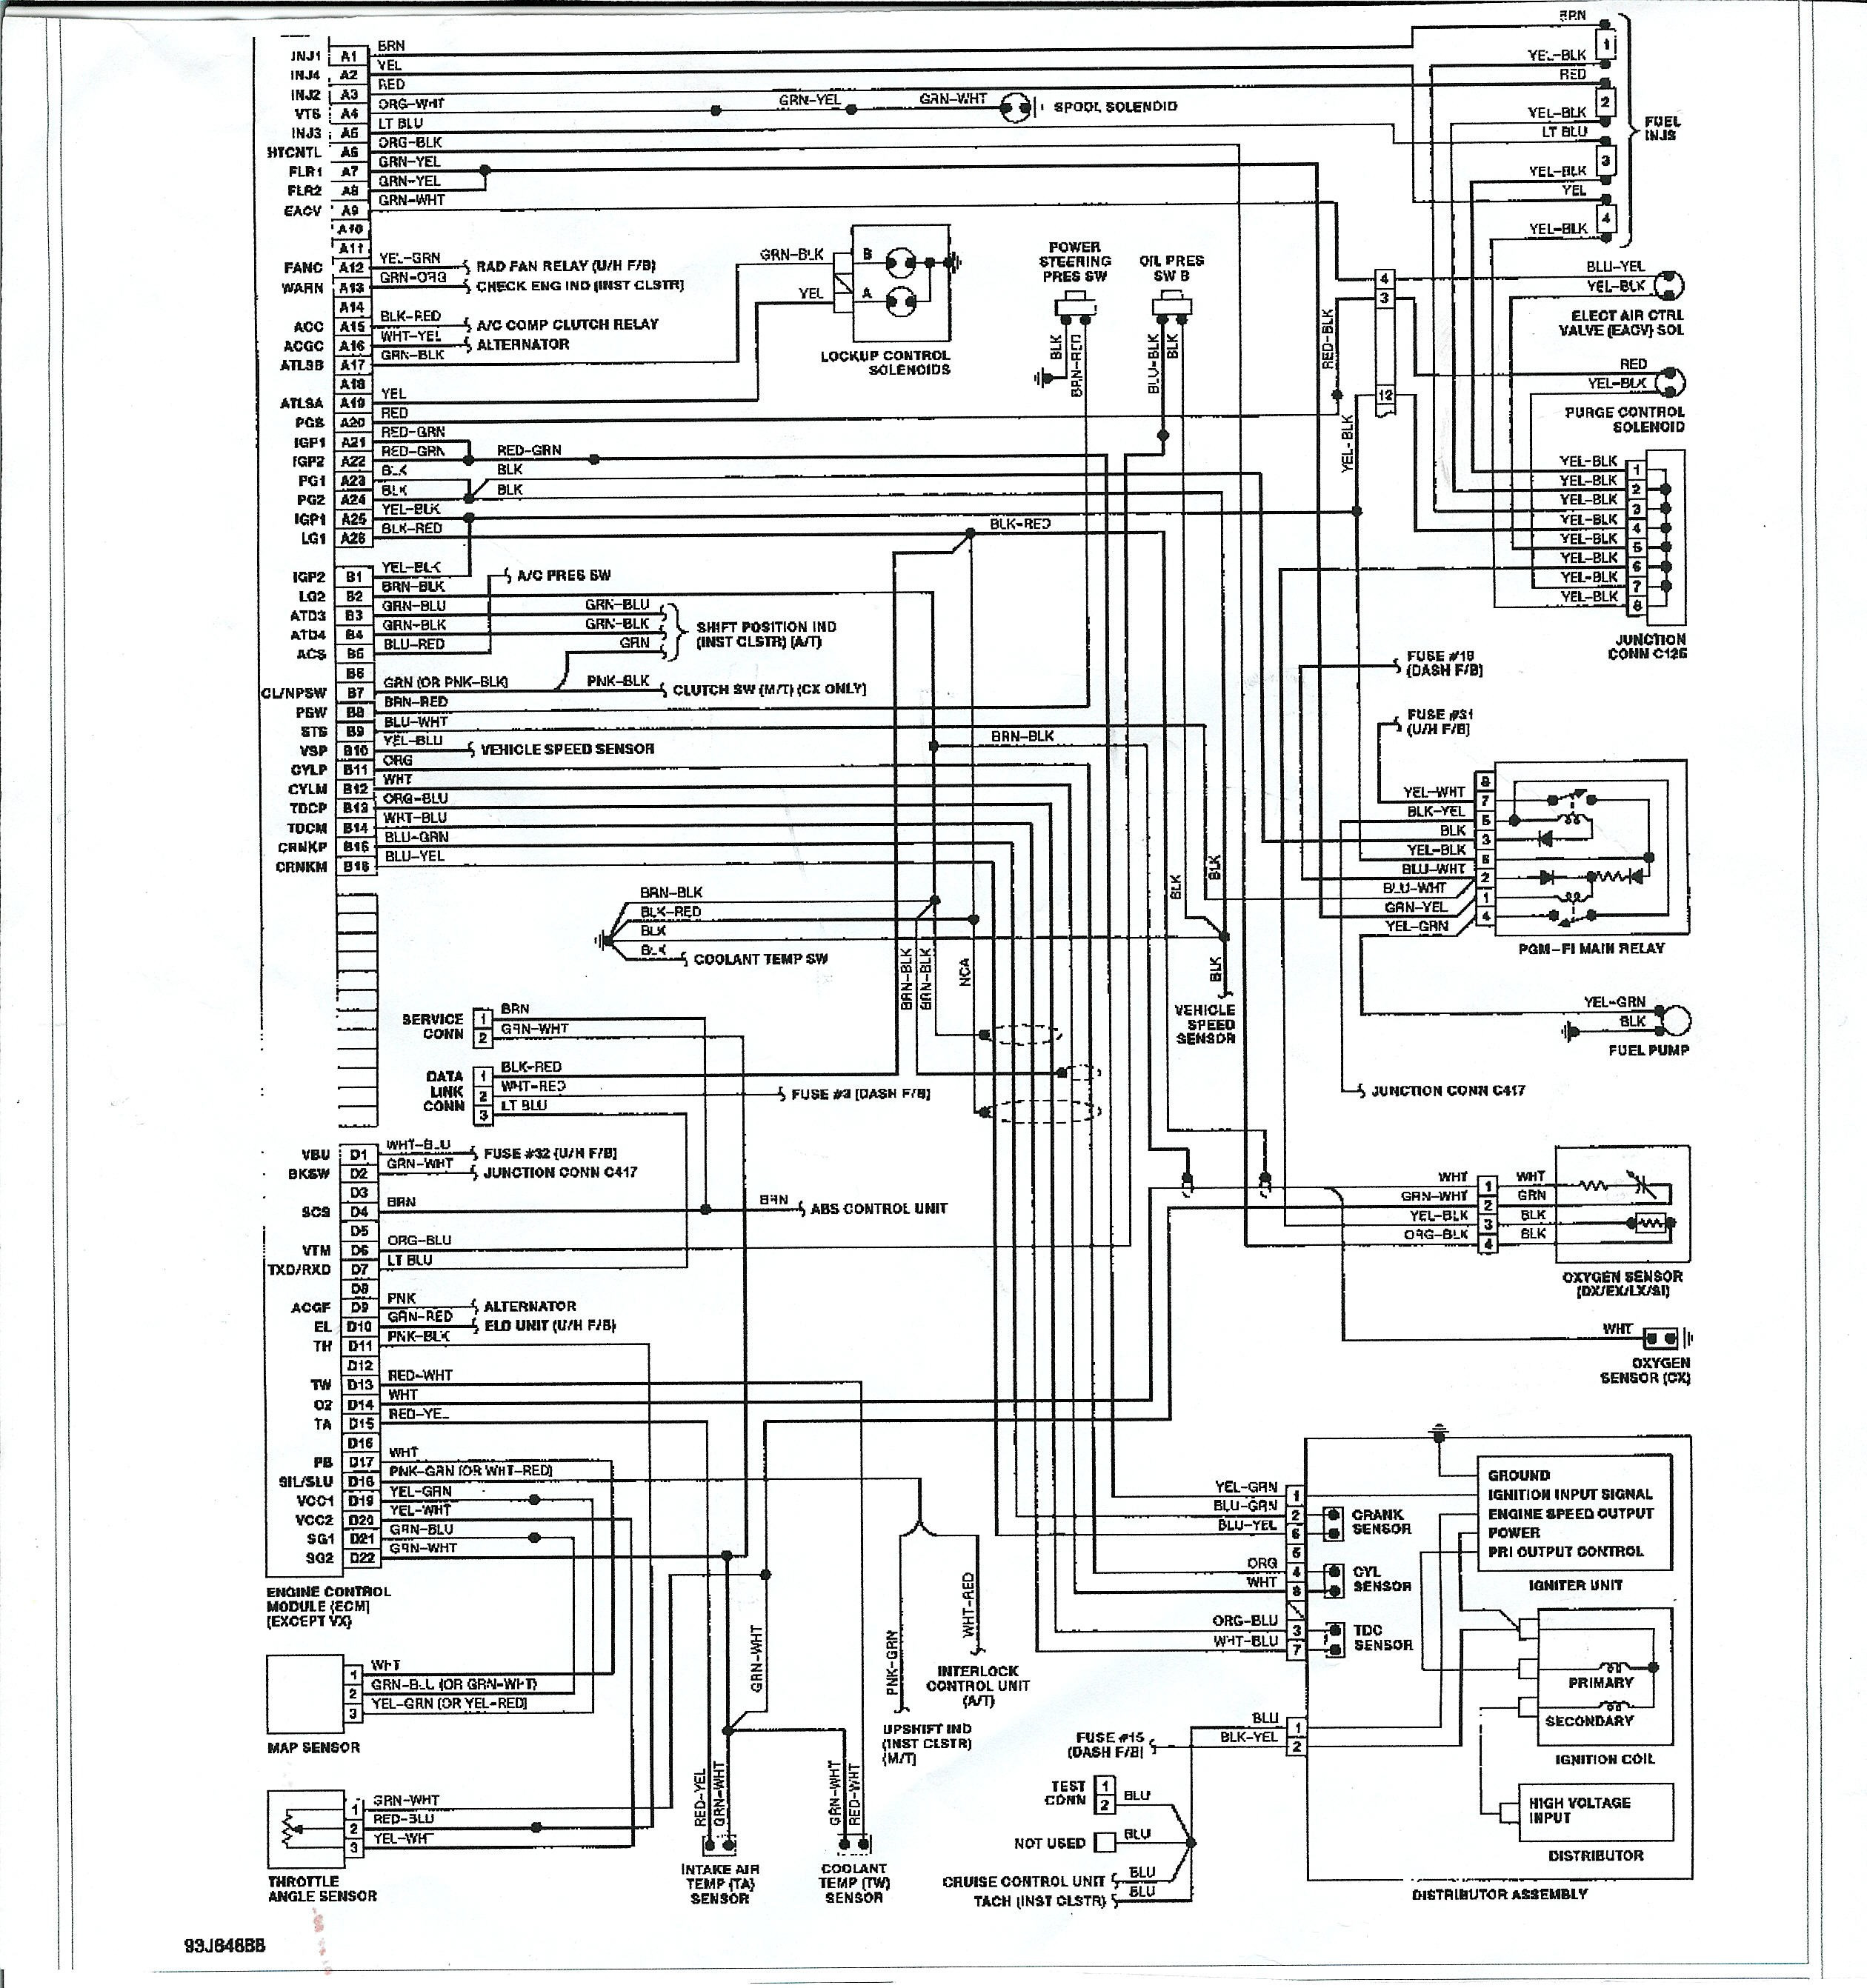 1995 Honda Accord Engine Diagram Awesome Wiring Diagram Honda Civic Everything You Need to Of 1995 Honda Accord Engine Diagram